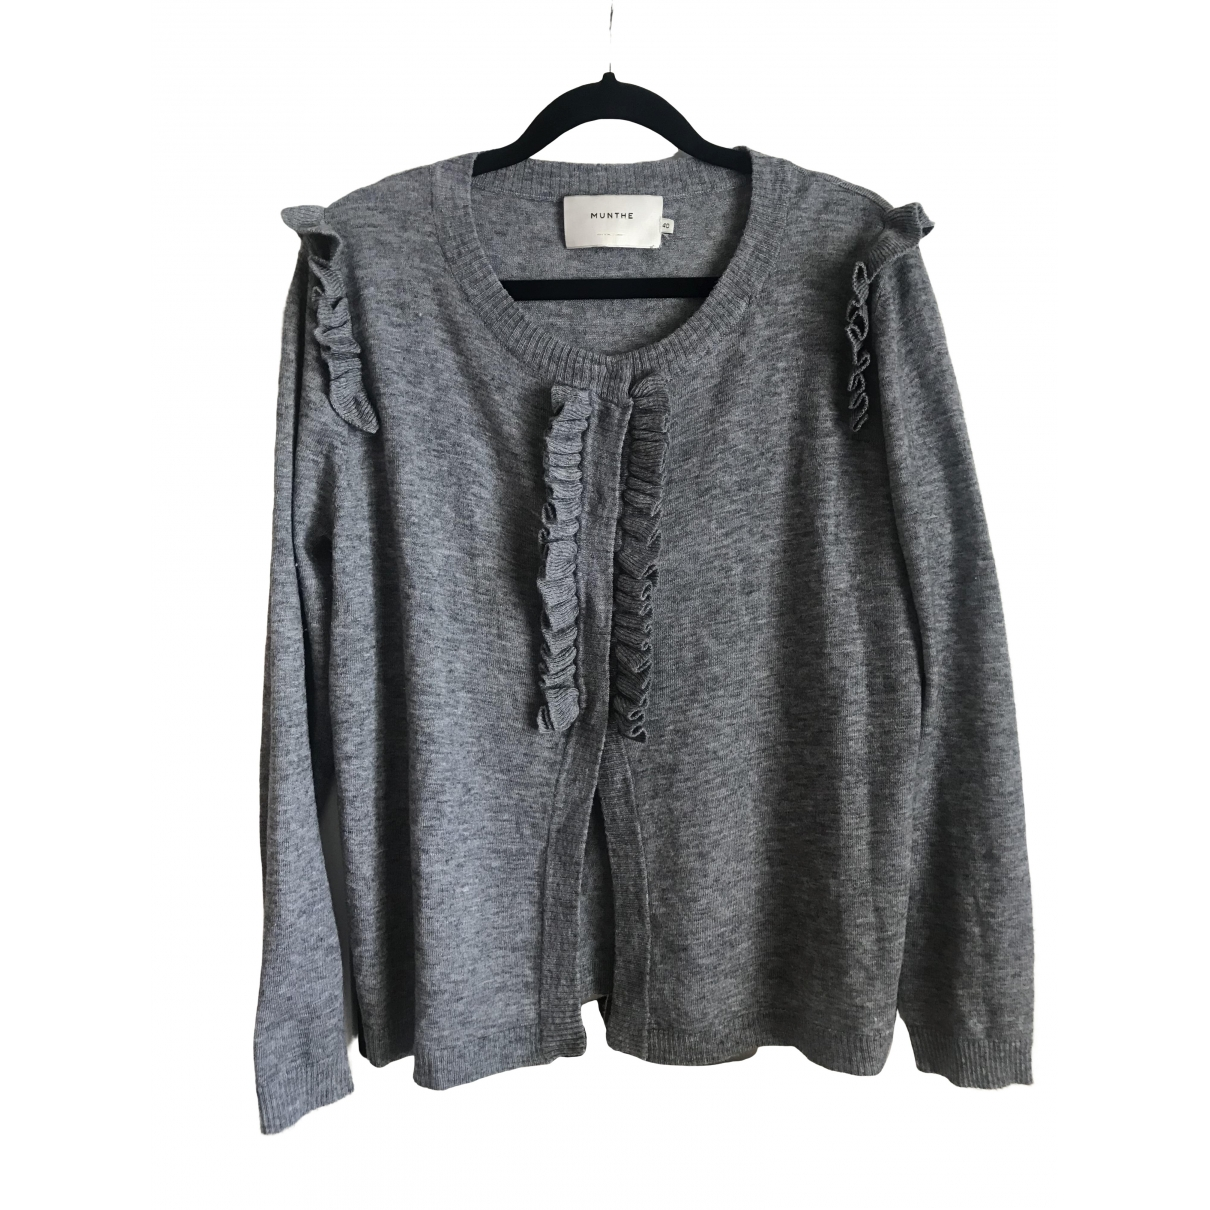 Munthe \N Pullover in  Grau Wolle